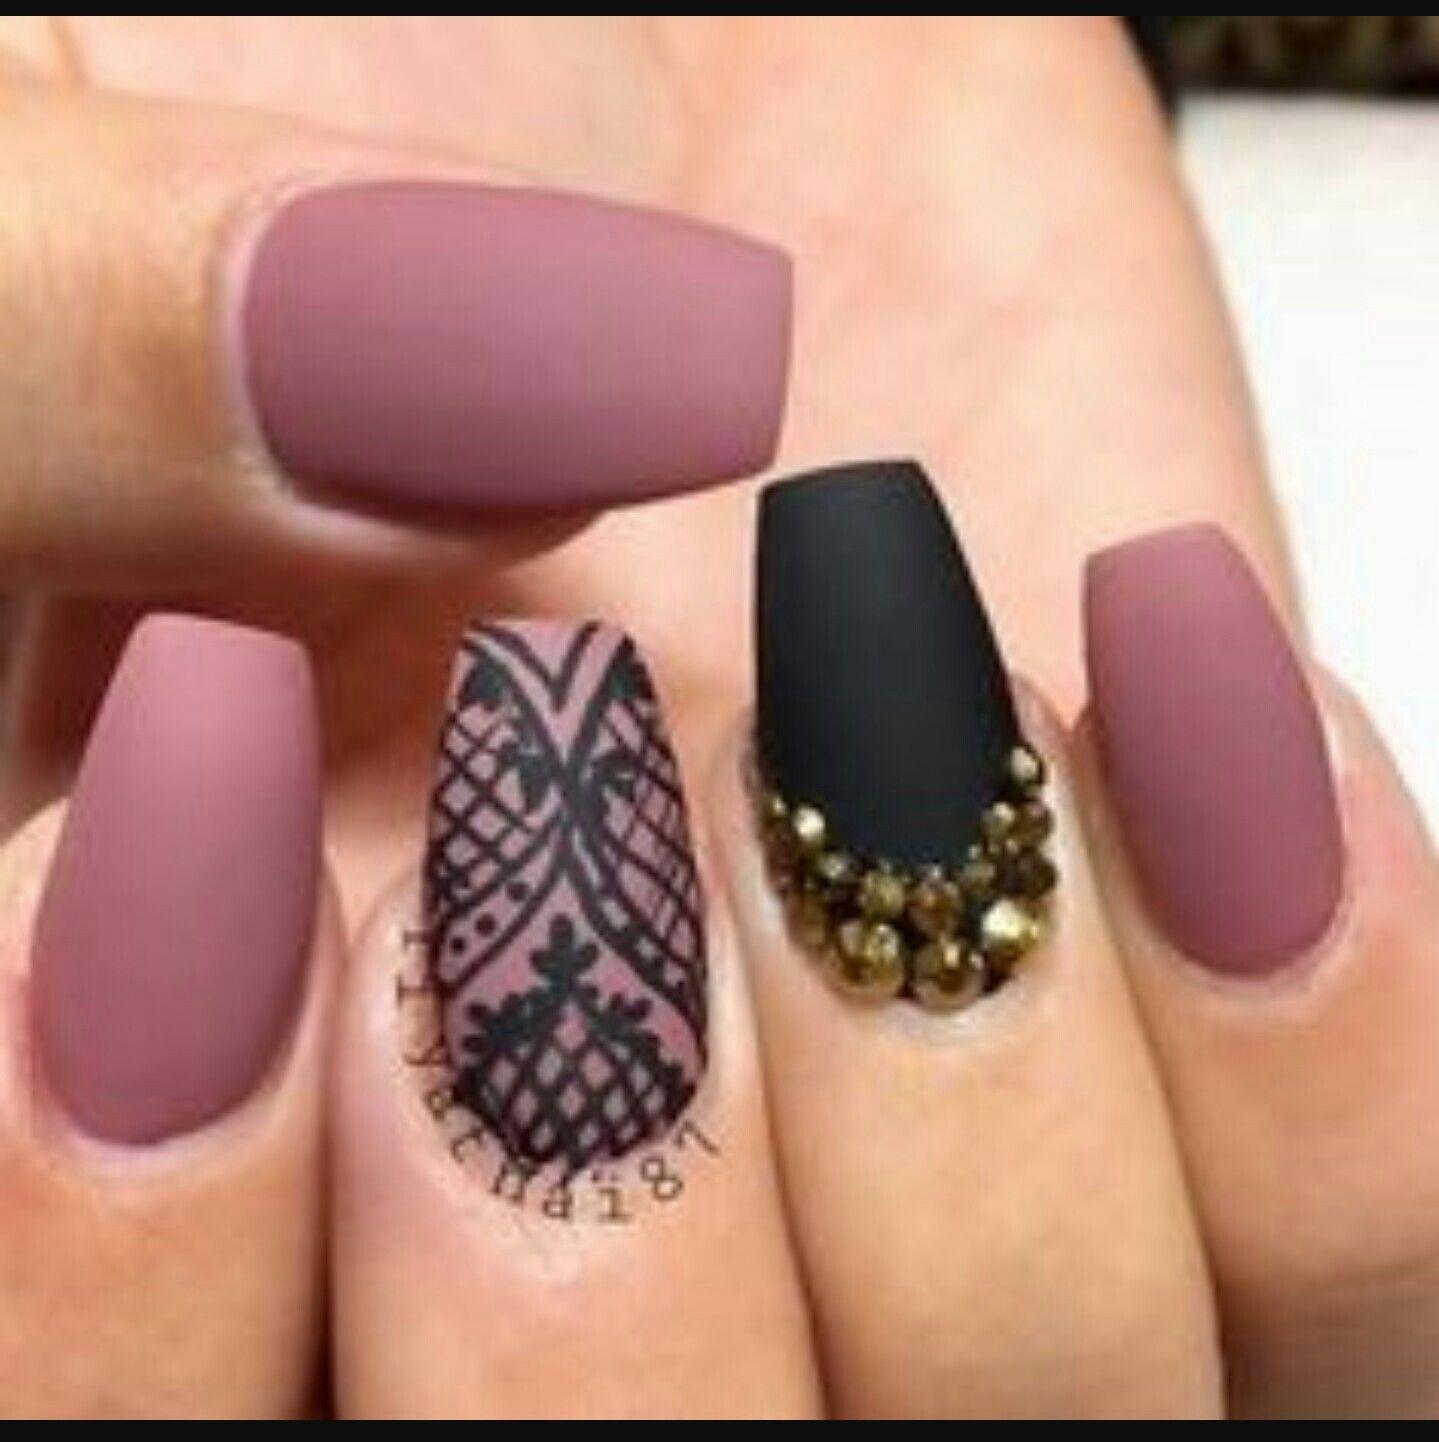 nails #coffin #nude #pink #black | makeup | Pinterest | Ballerina ...